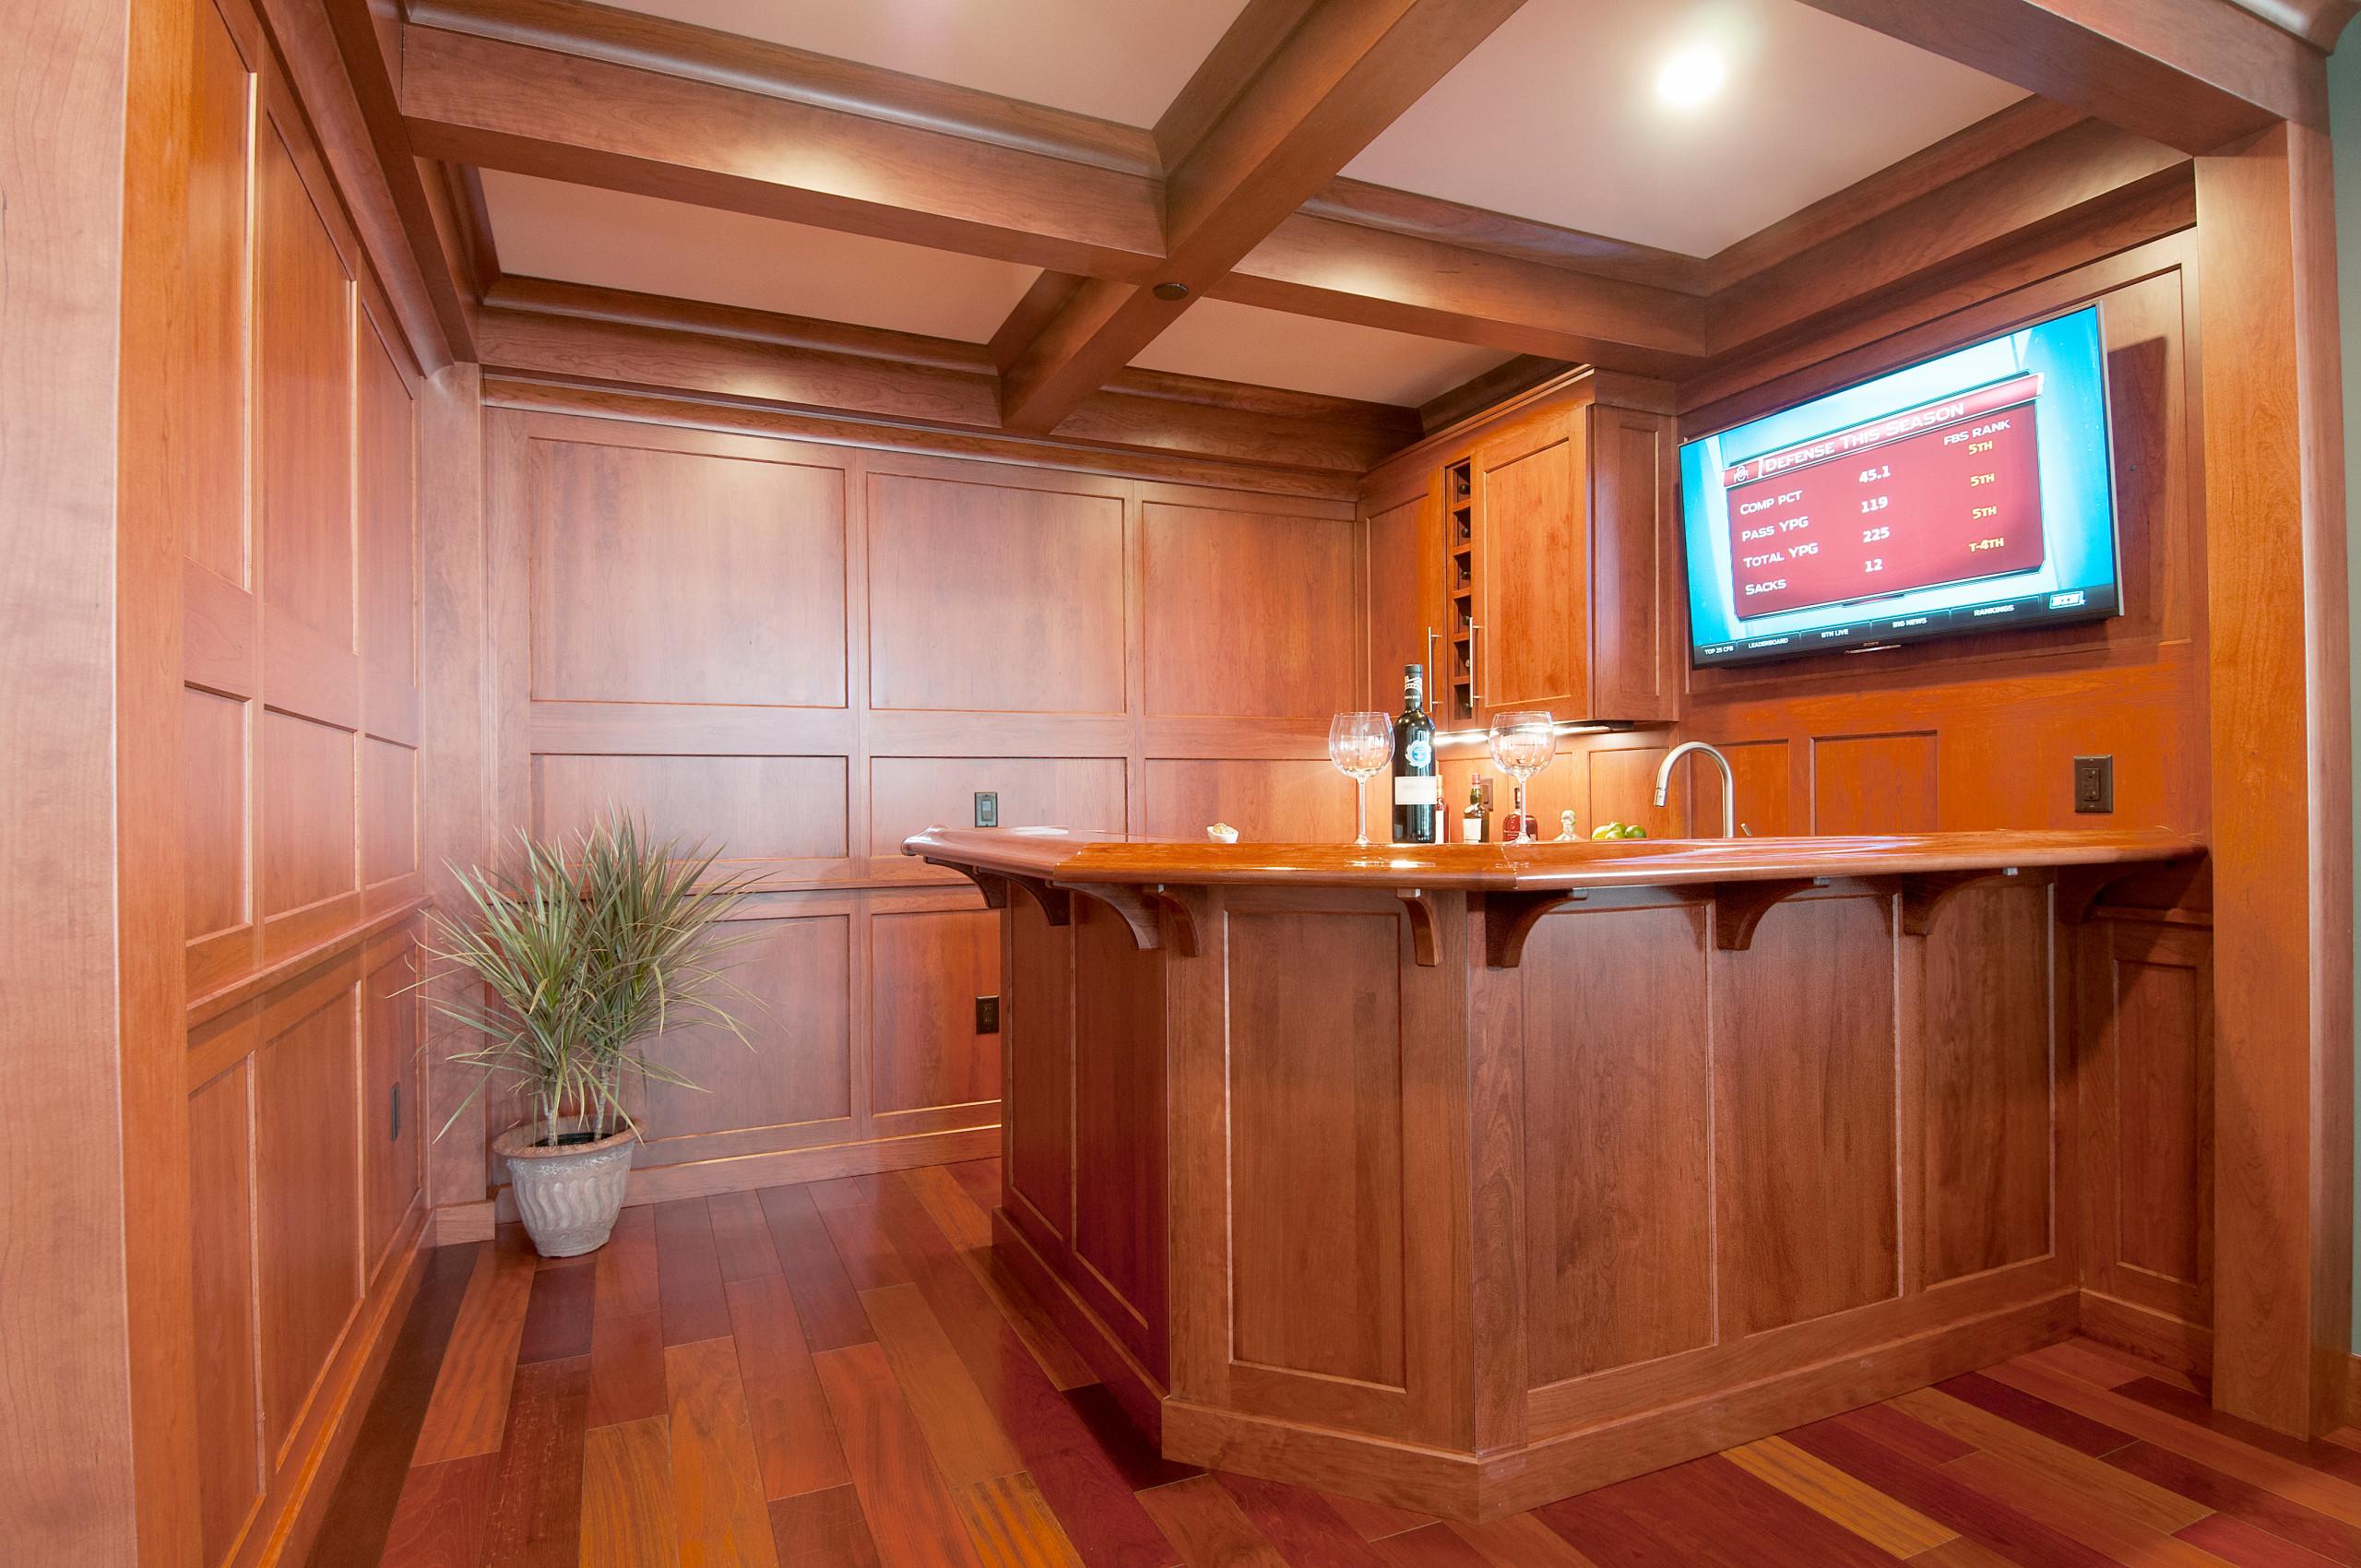 Award-Winning Wet Bar in Penthouse Condo